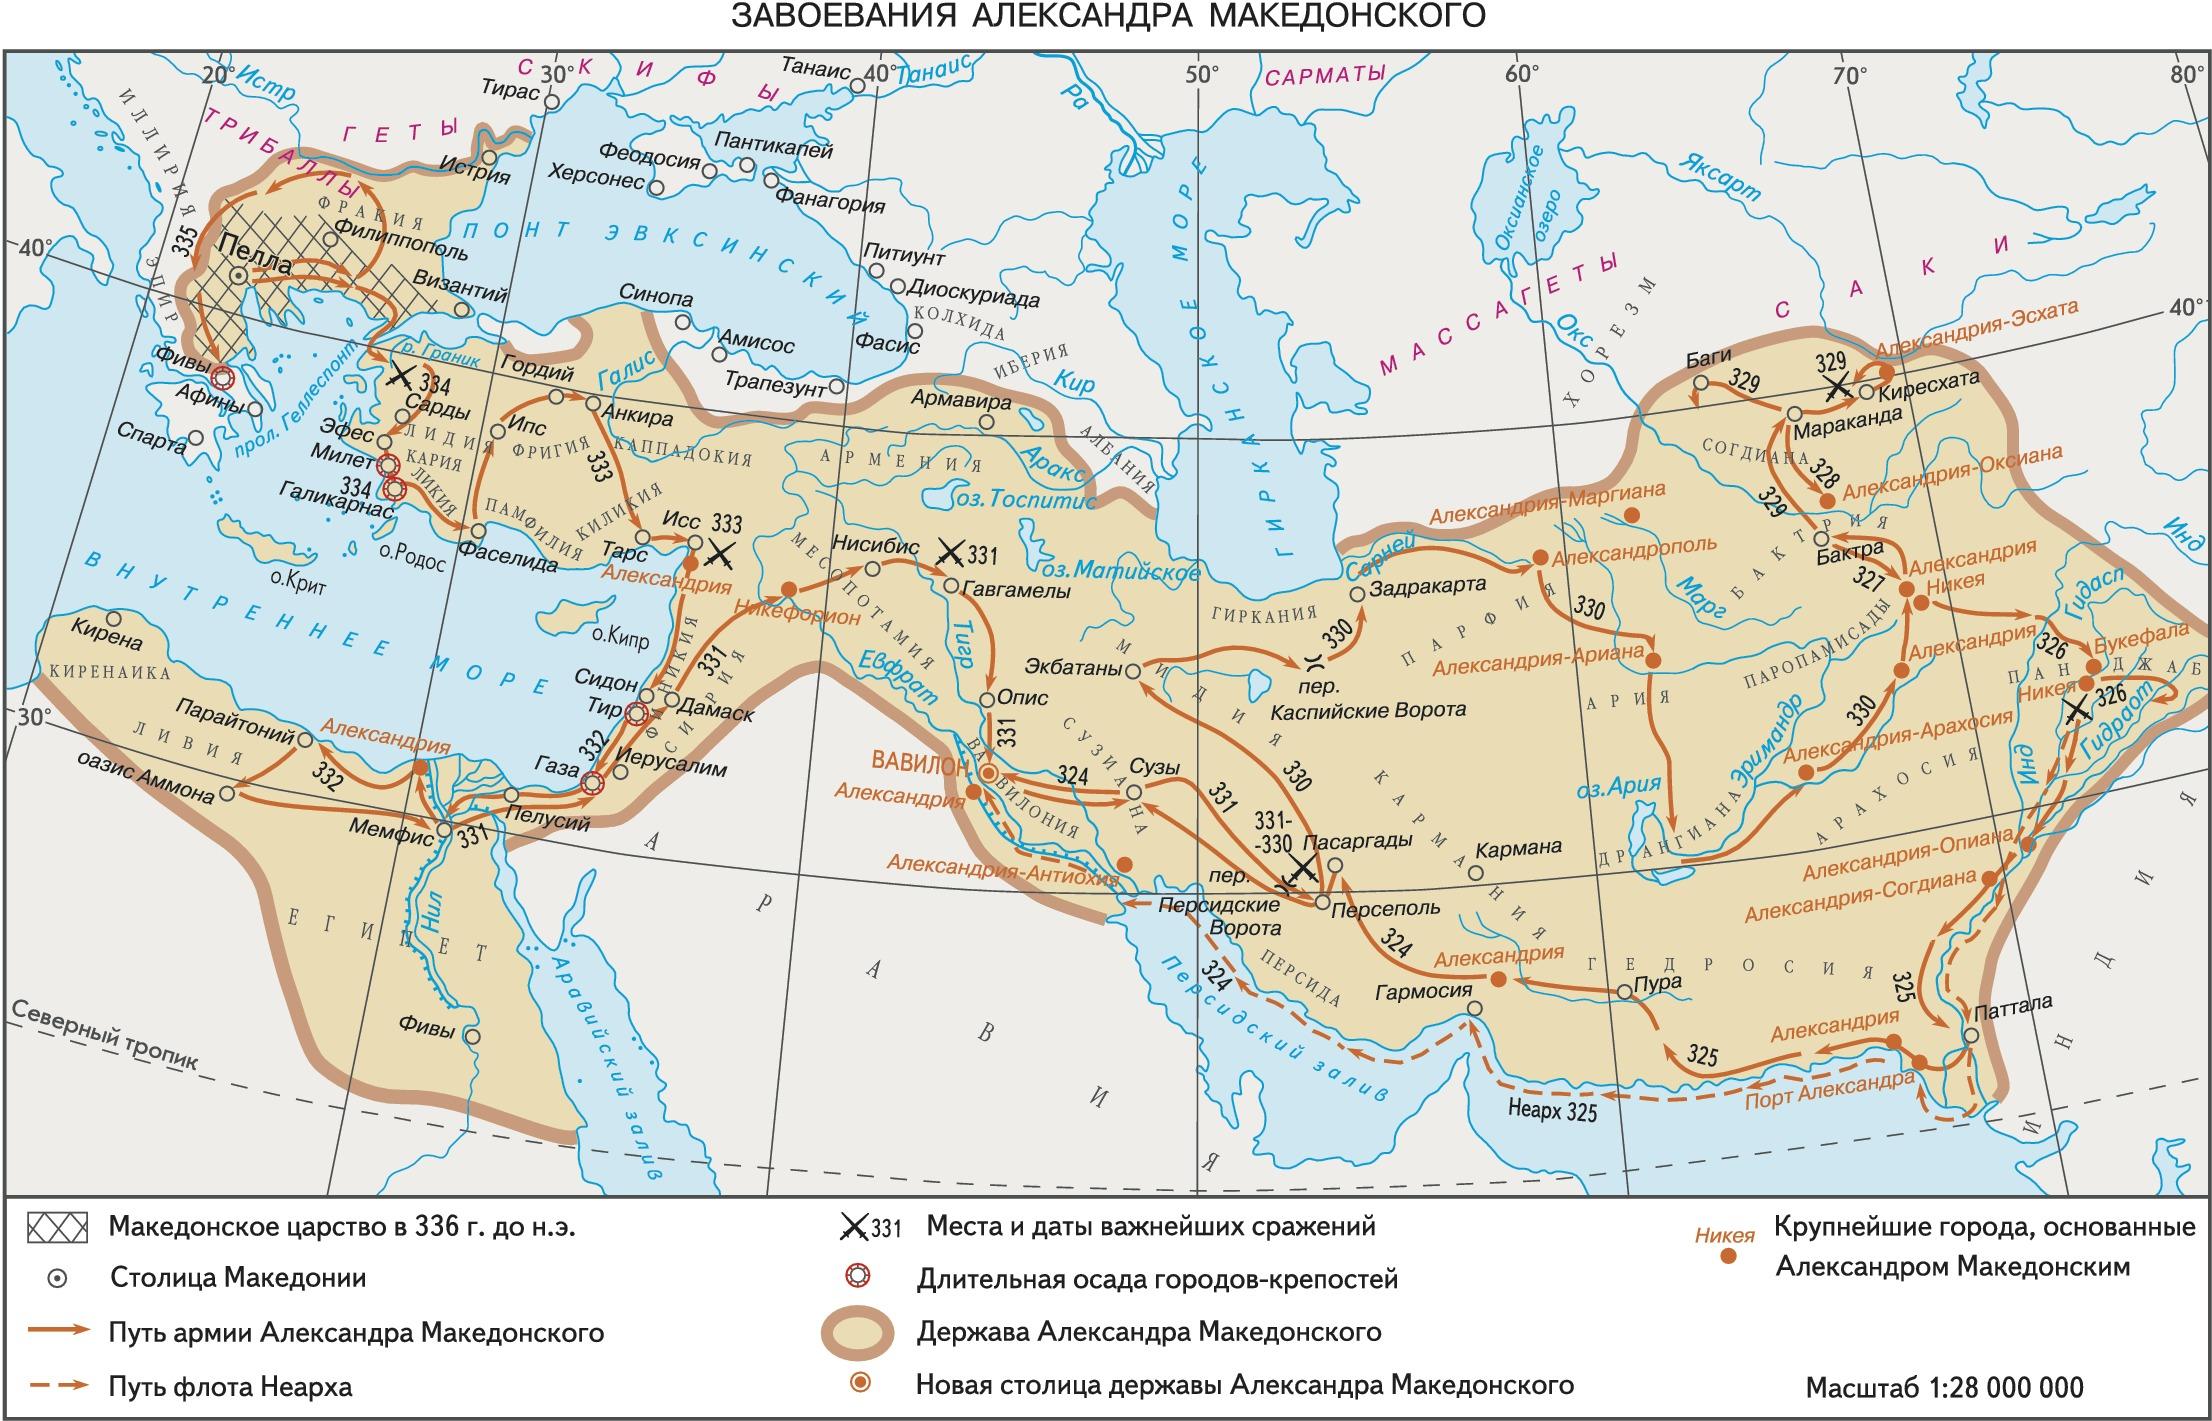 сообщение про александра македонского